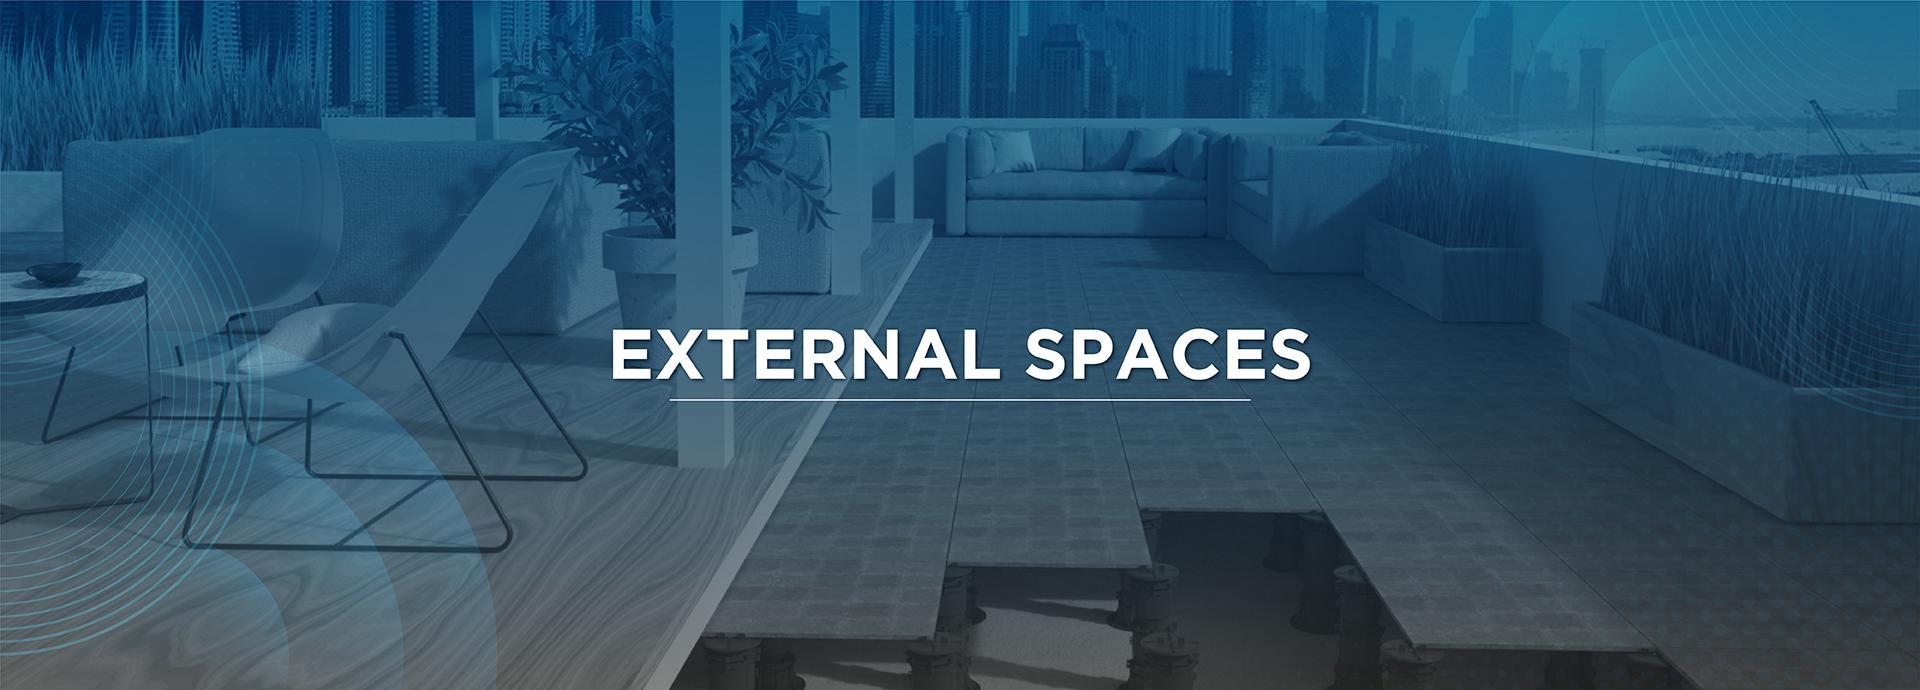 external spaces